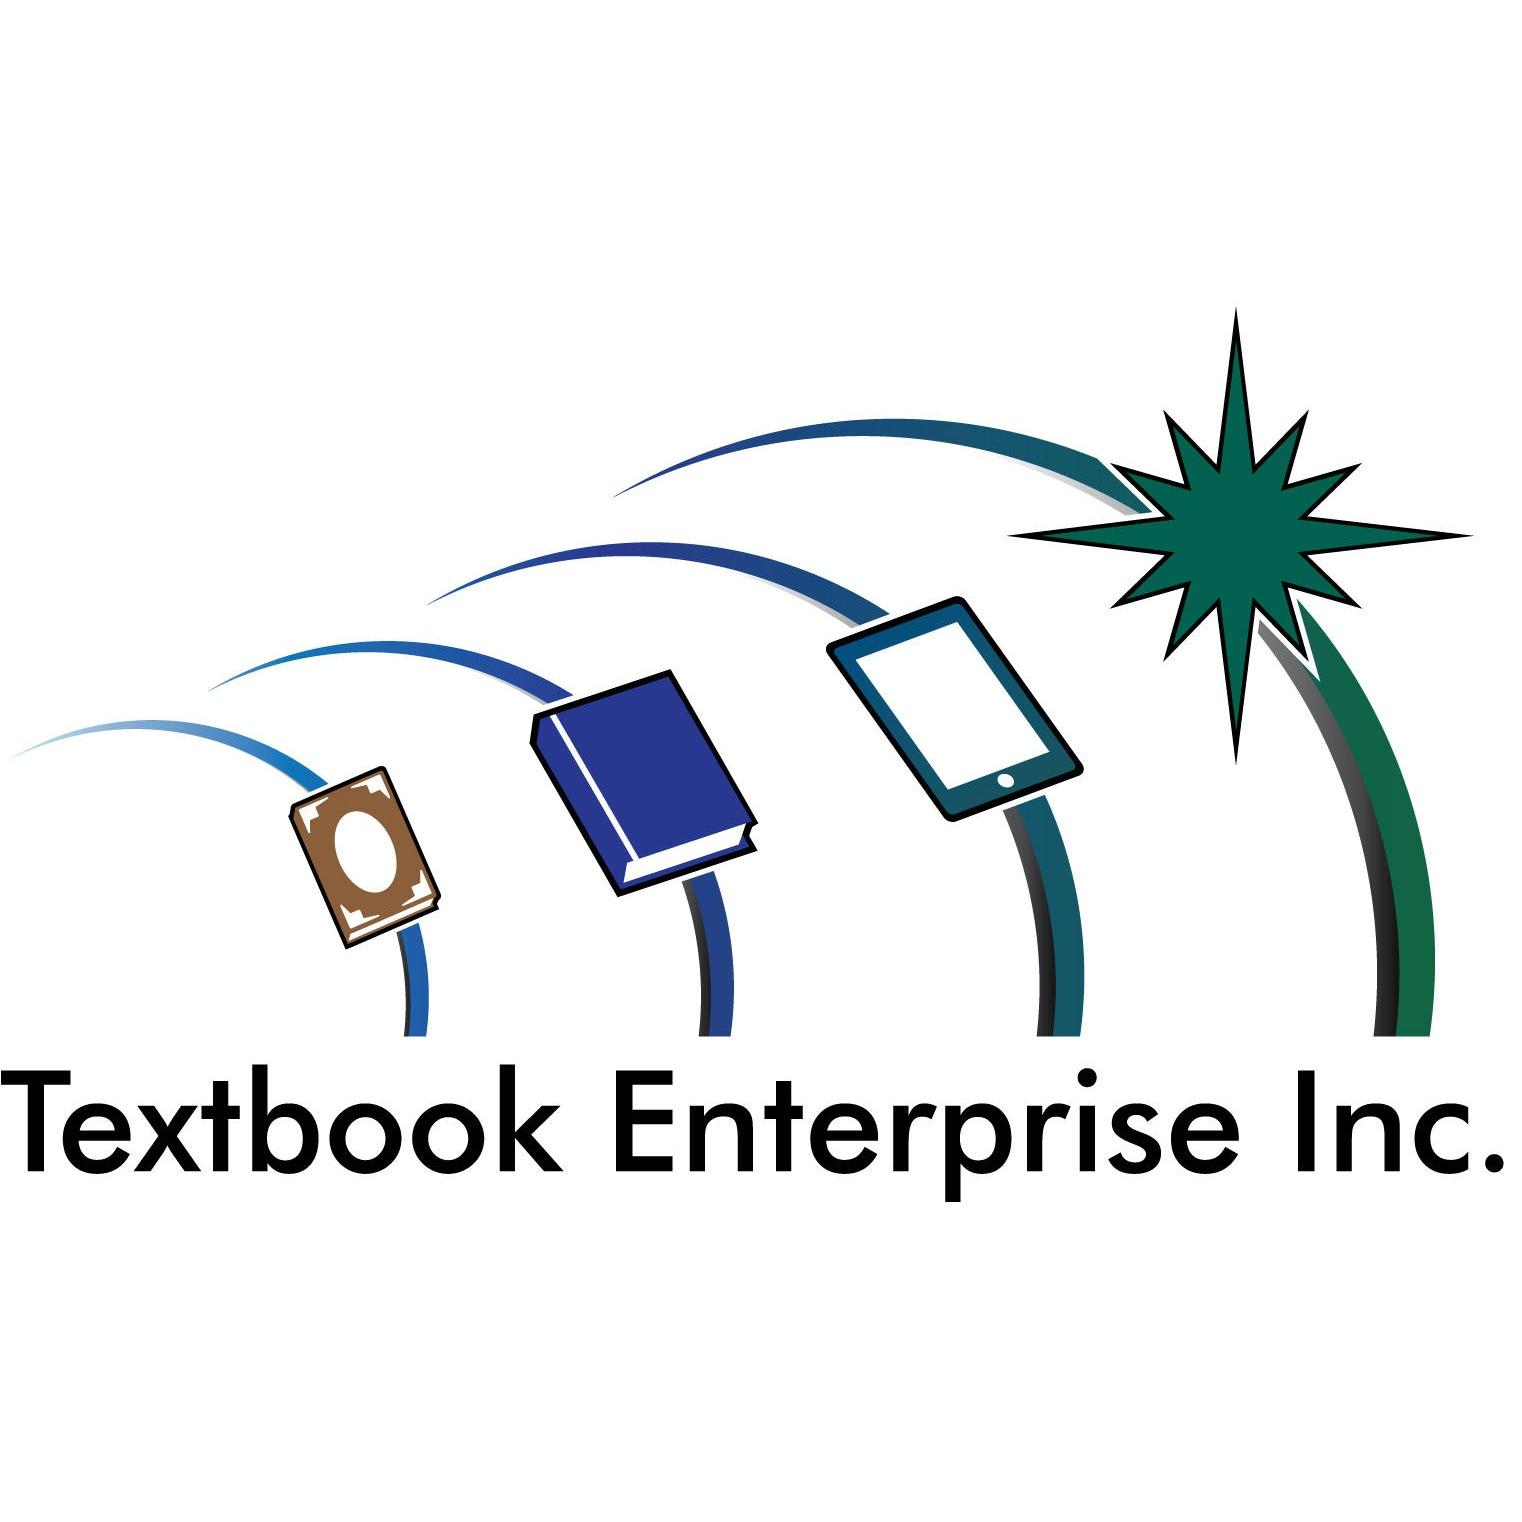 Textbook Enterprise Inc